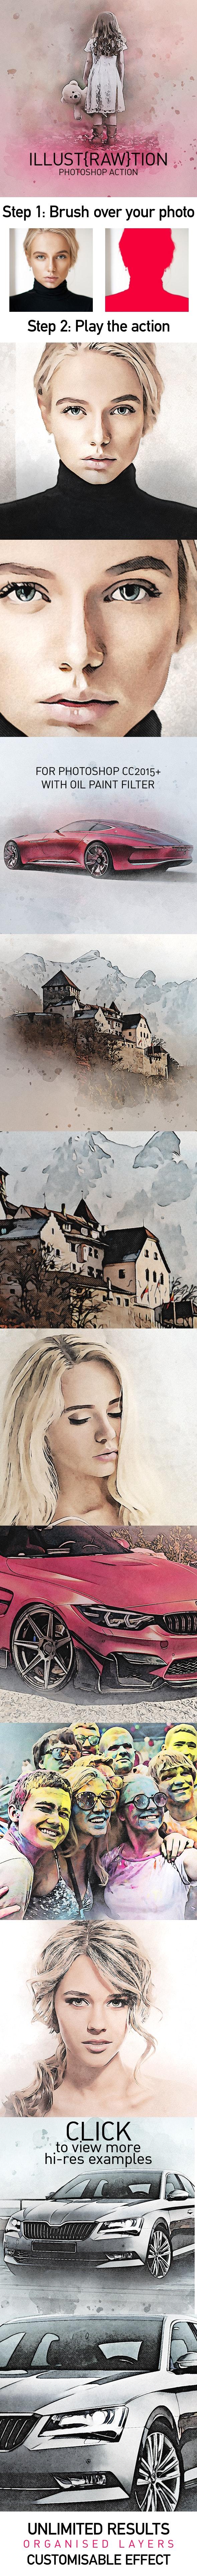 IllustRAWtion Photoshop Action - Photo Effects Actions